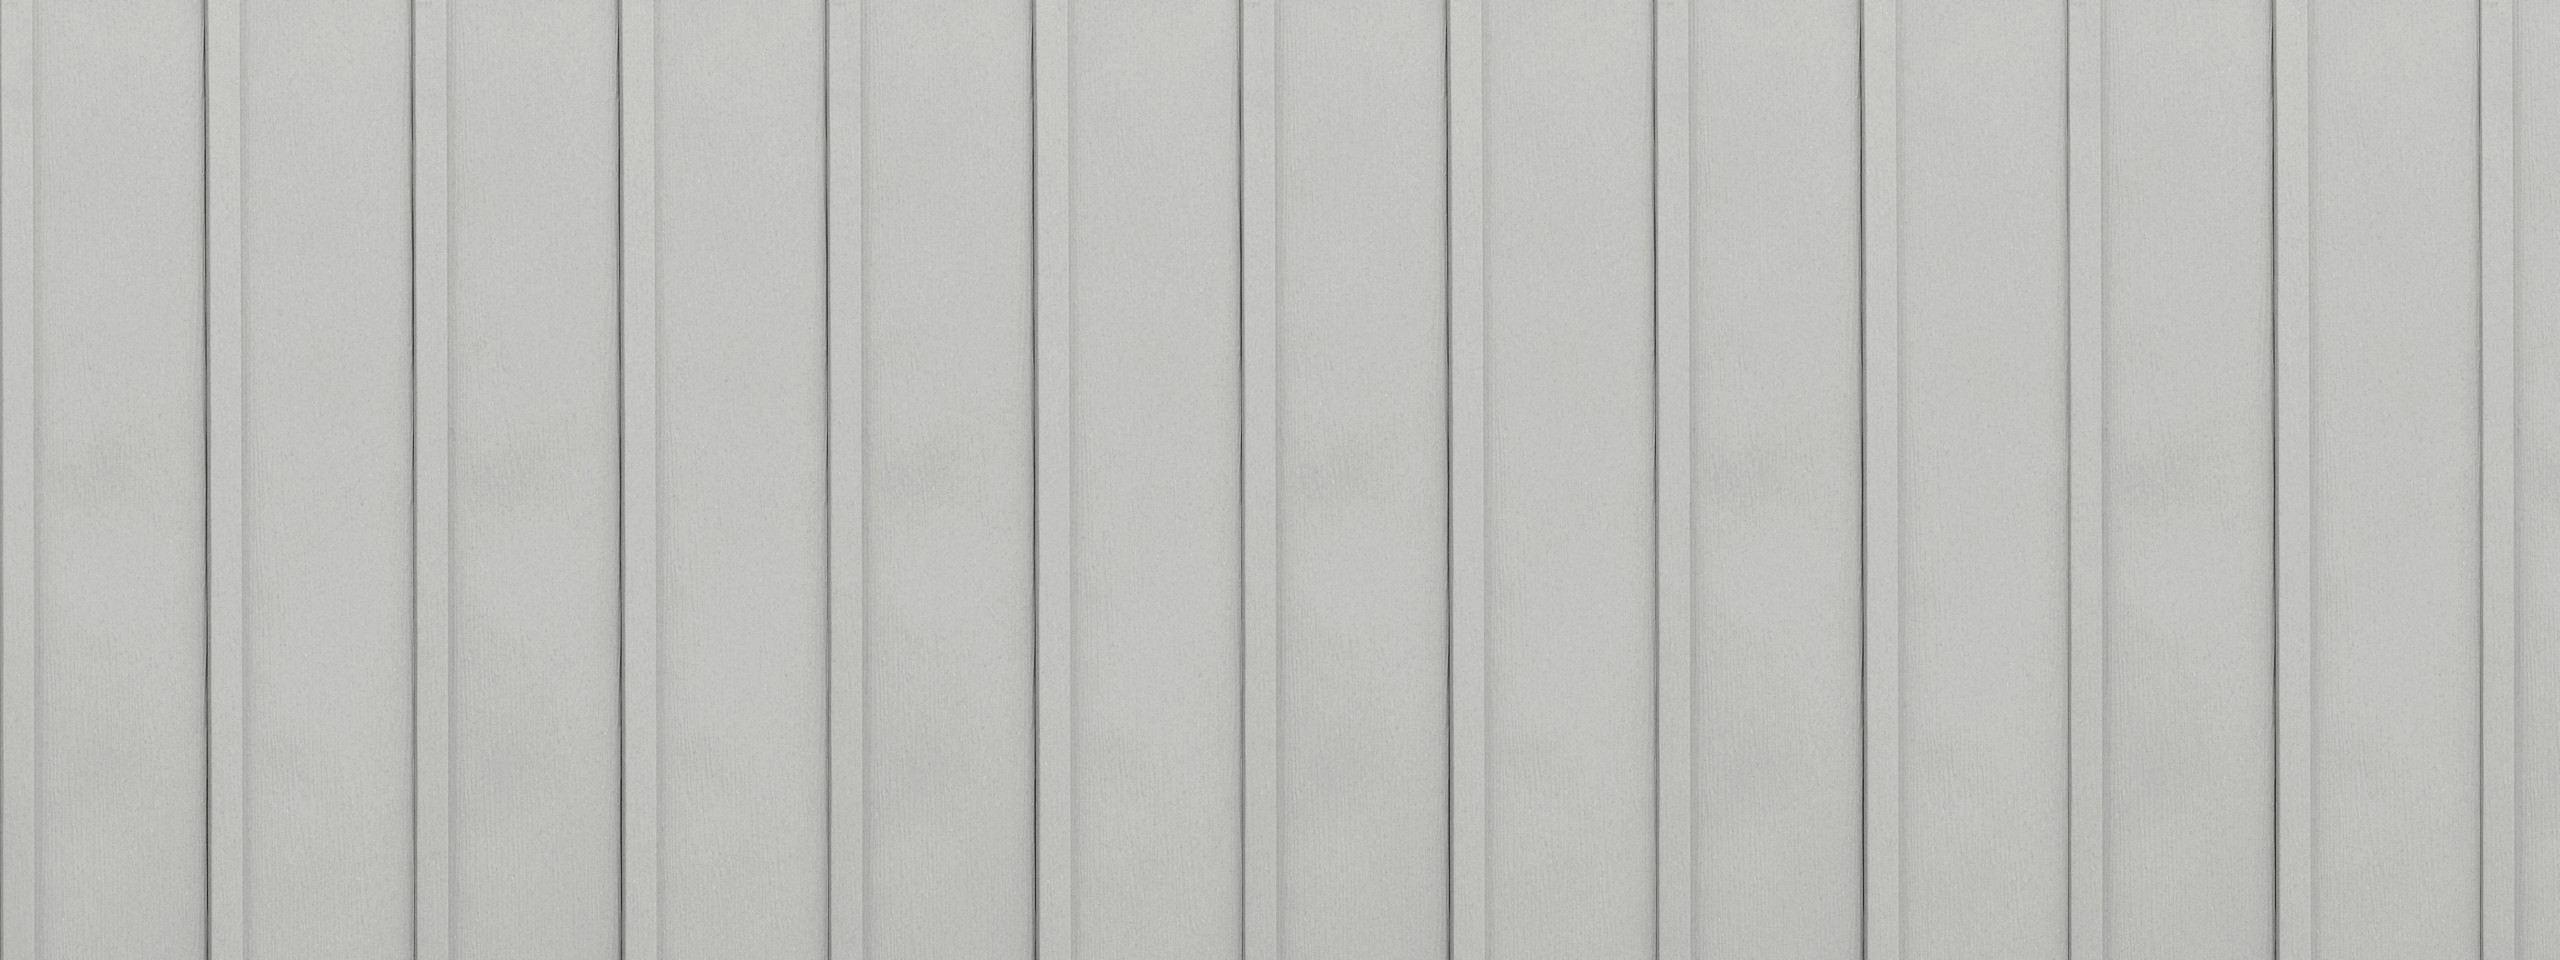 Entex vertical glacier white board and batten steel siding